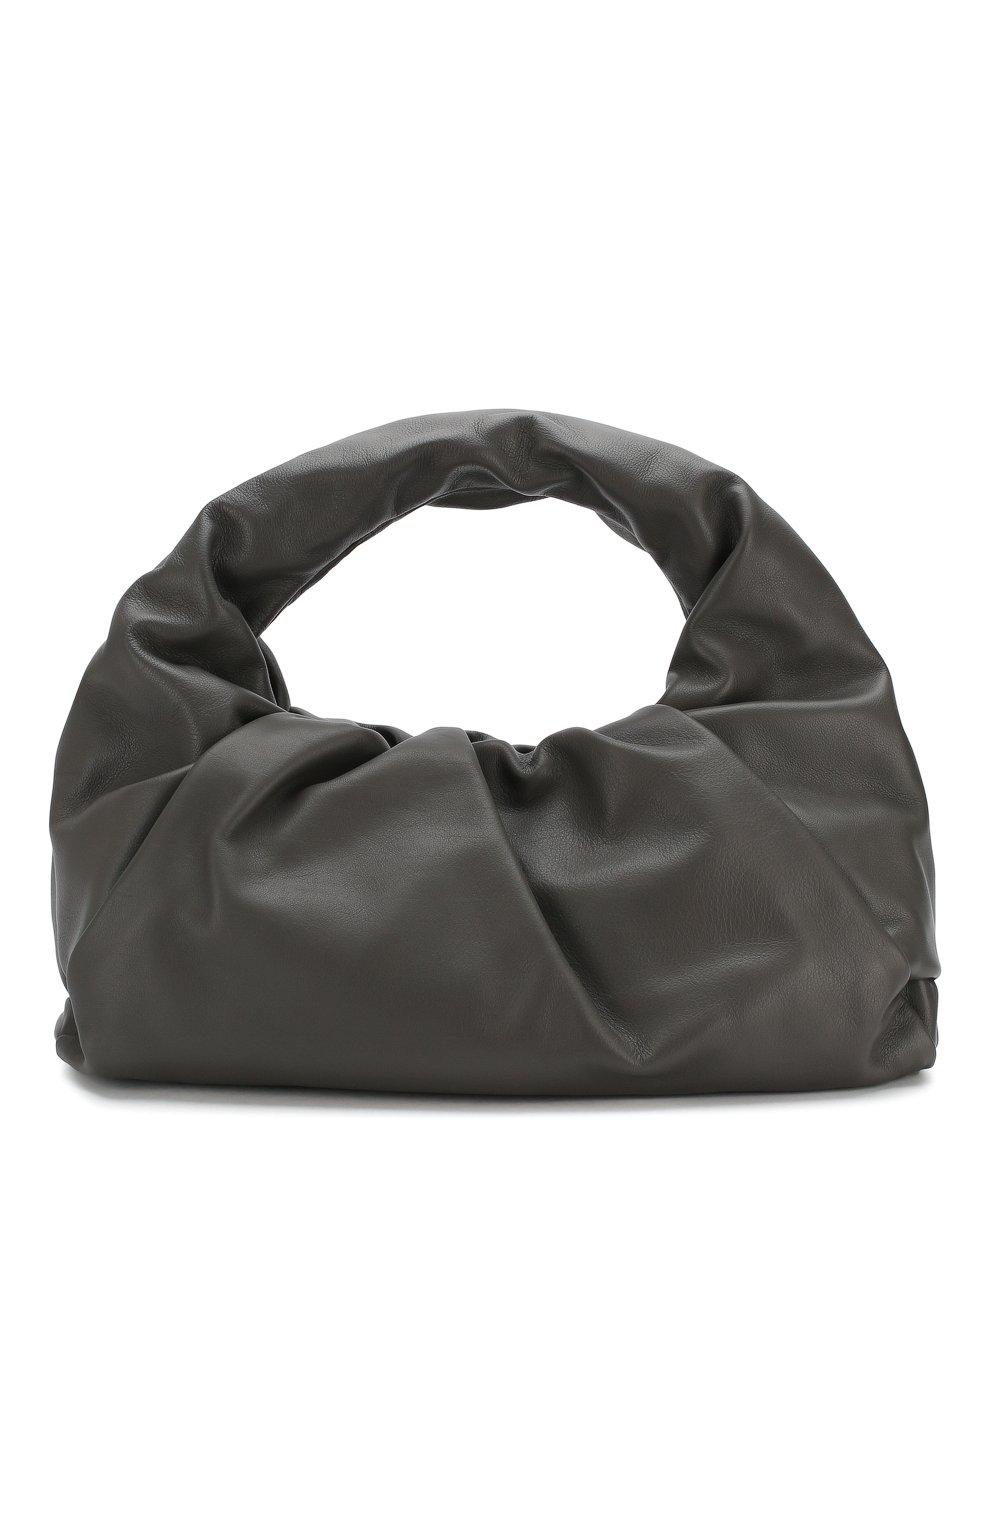 Женская сумка shoulder pouch BOTTEGA VENETA темно-серого цвета, арт. 610524/VCP40 | Фото 1